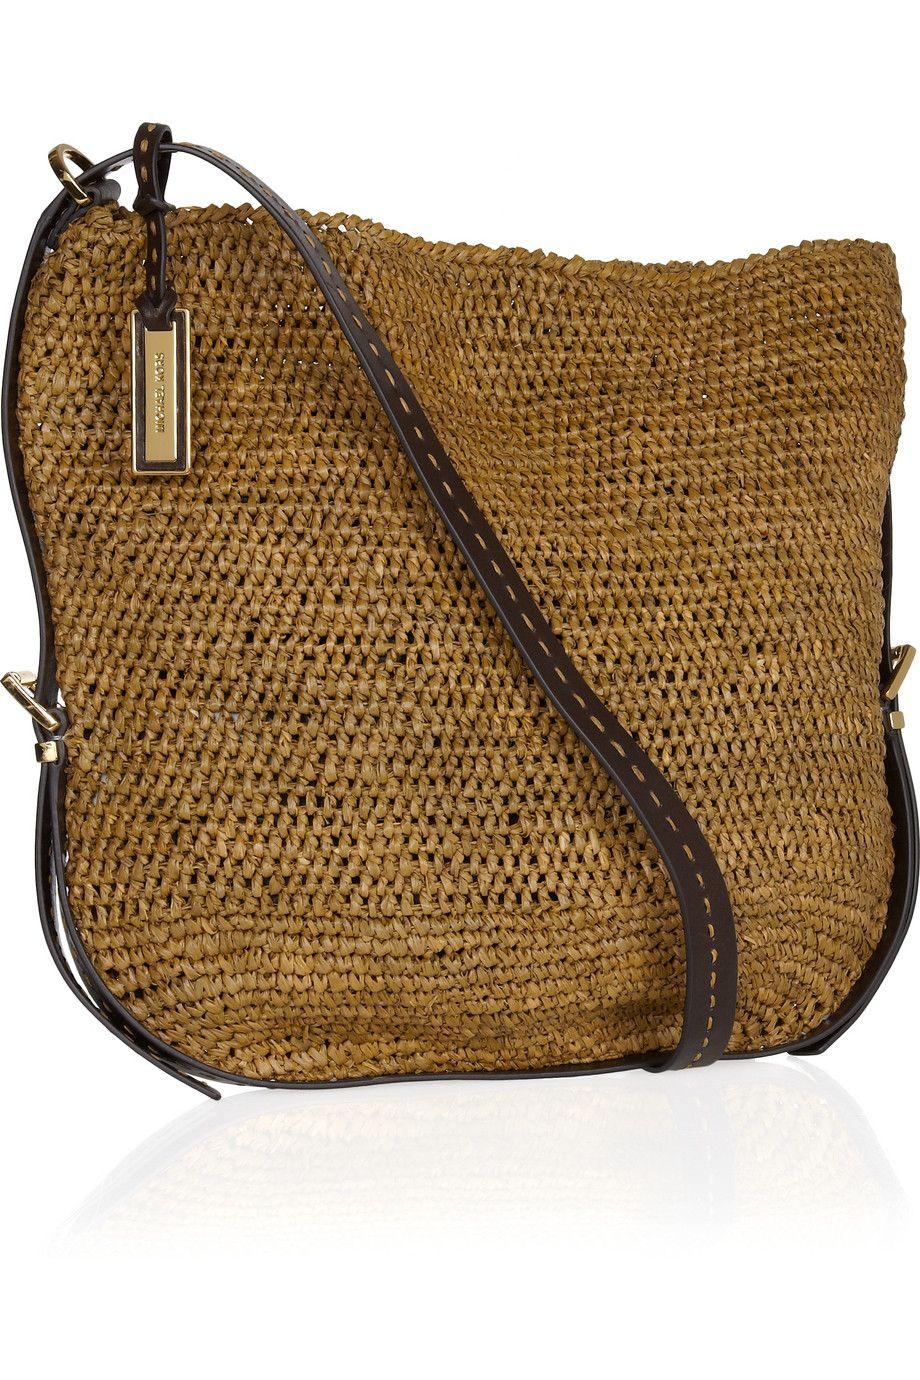 b2c1cceb3c51d4 large raffia & straw crossbody bag, by michael kors | Beach ...